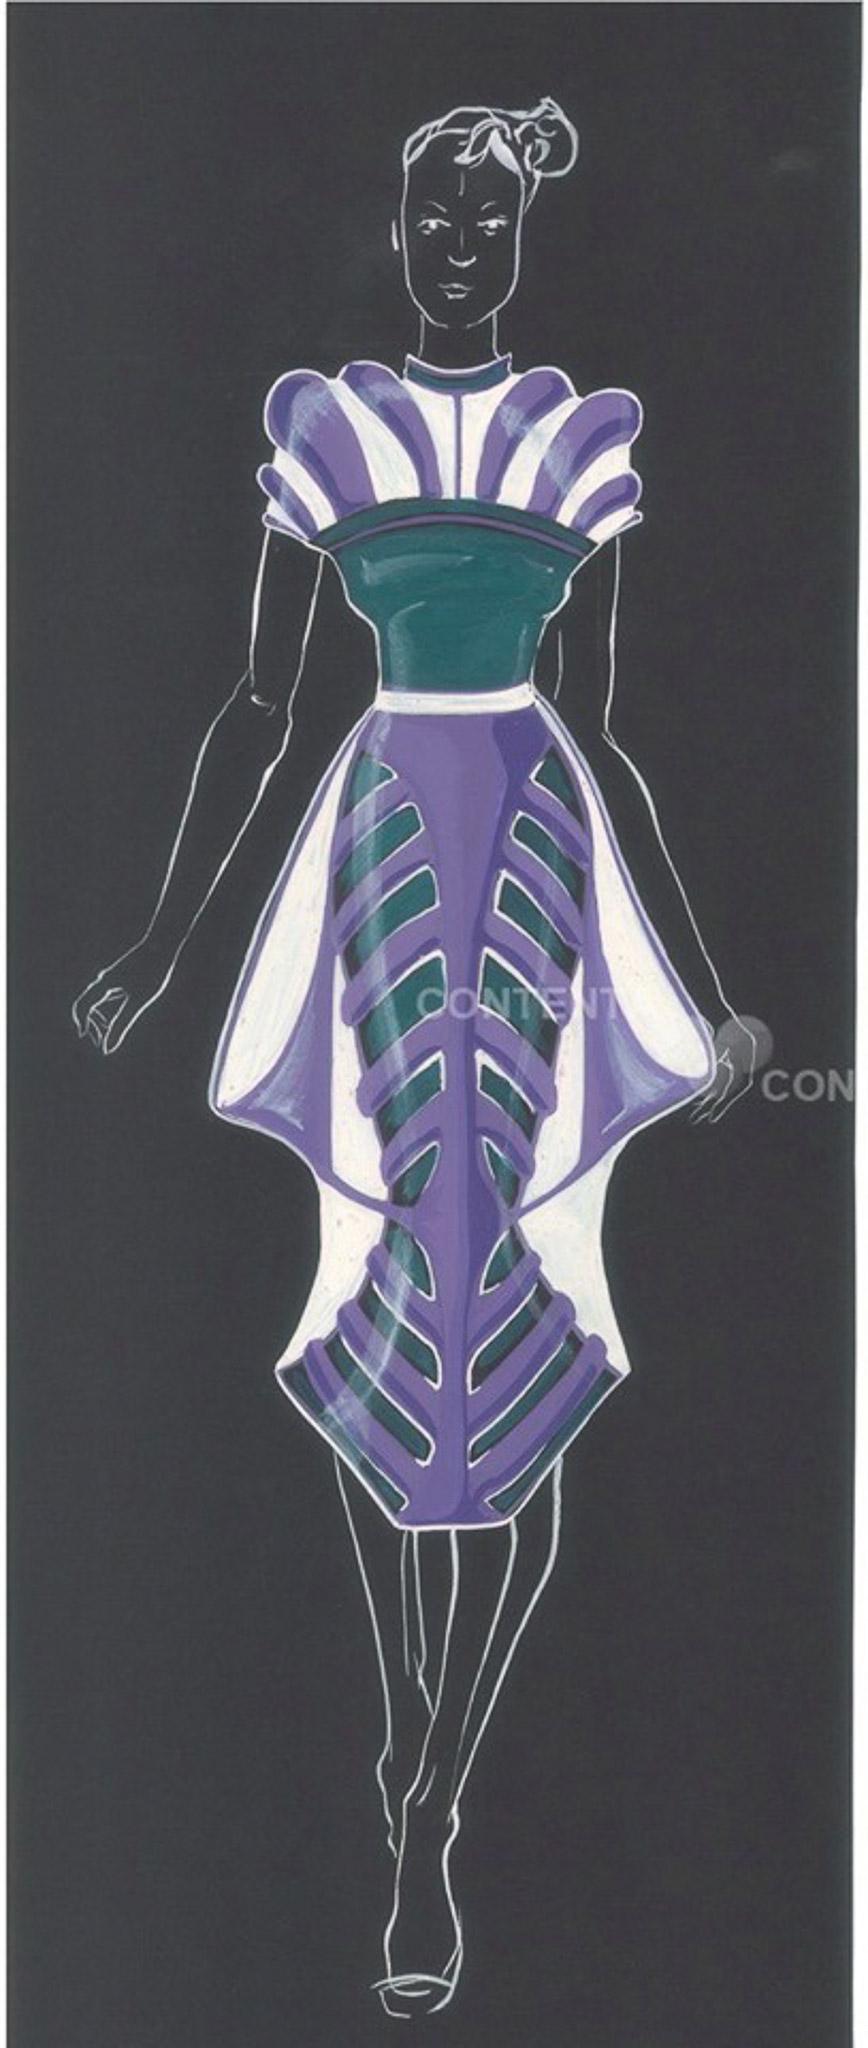 The Future Style: Oksana Baranovska, Ukraine, Newcomer, Salvador Dali Academy of Modern Art (Dream your Dreams)